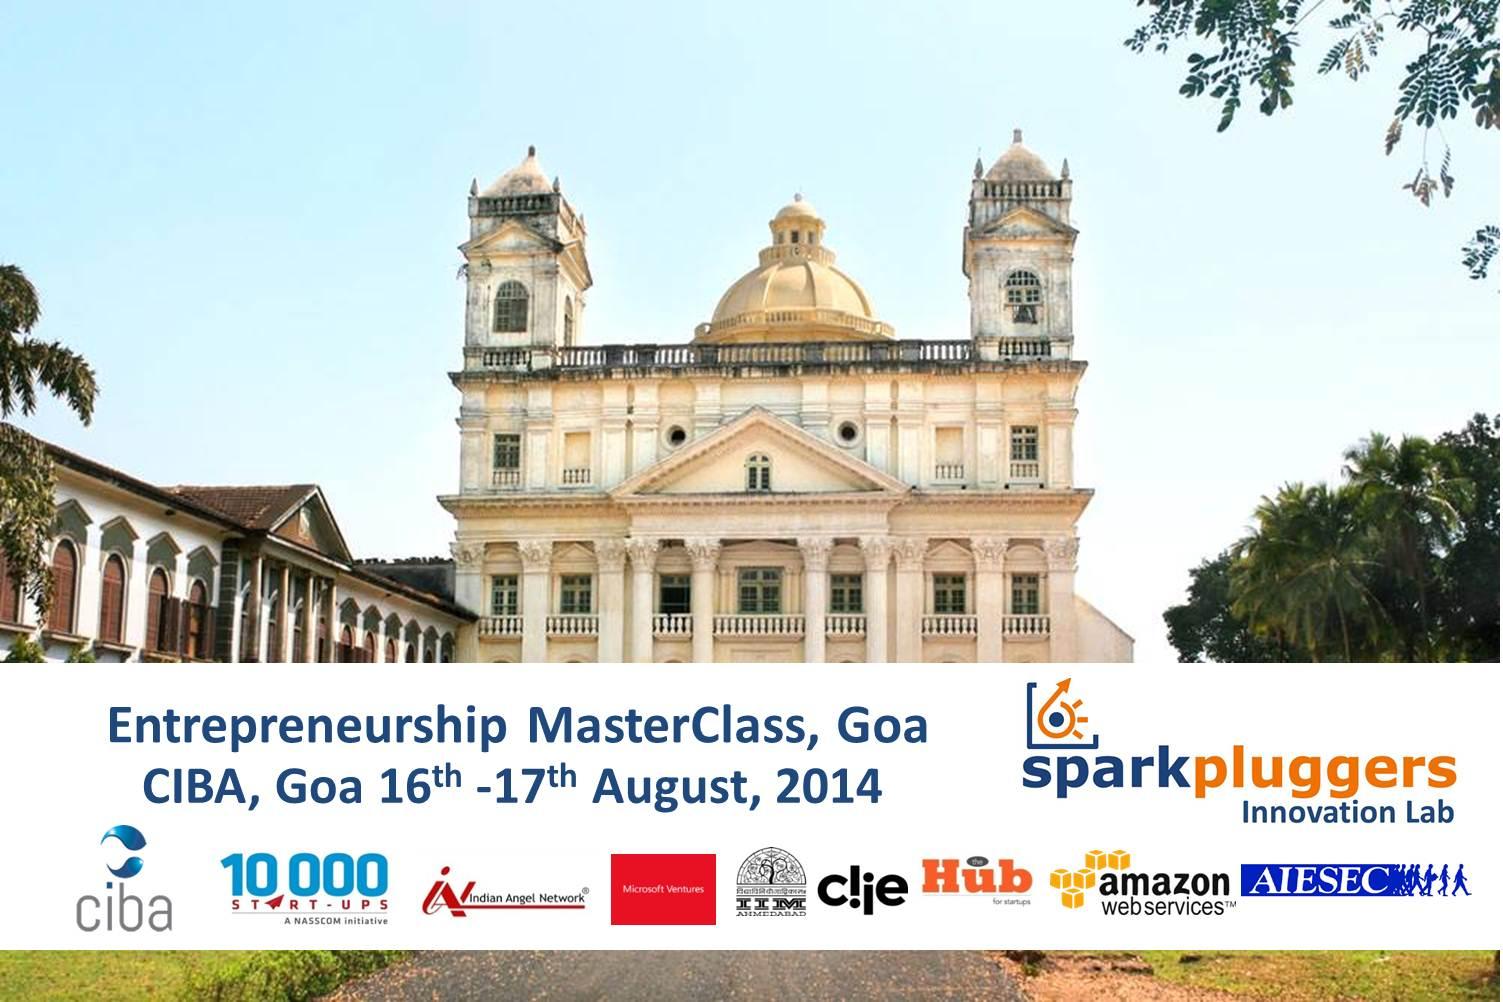 Sparkpluggers Entrepreneurship MasterClass Goa